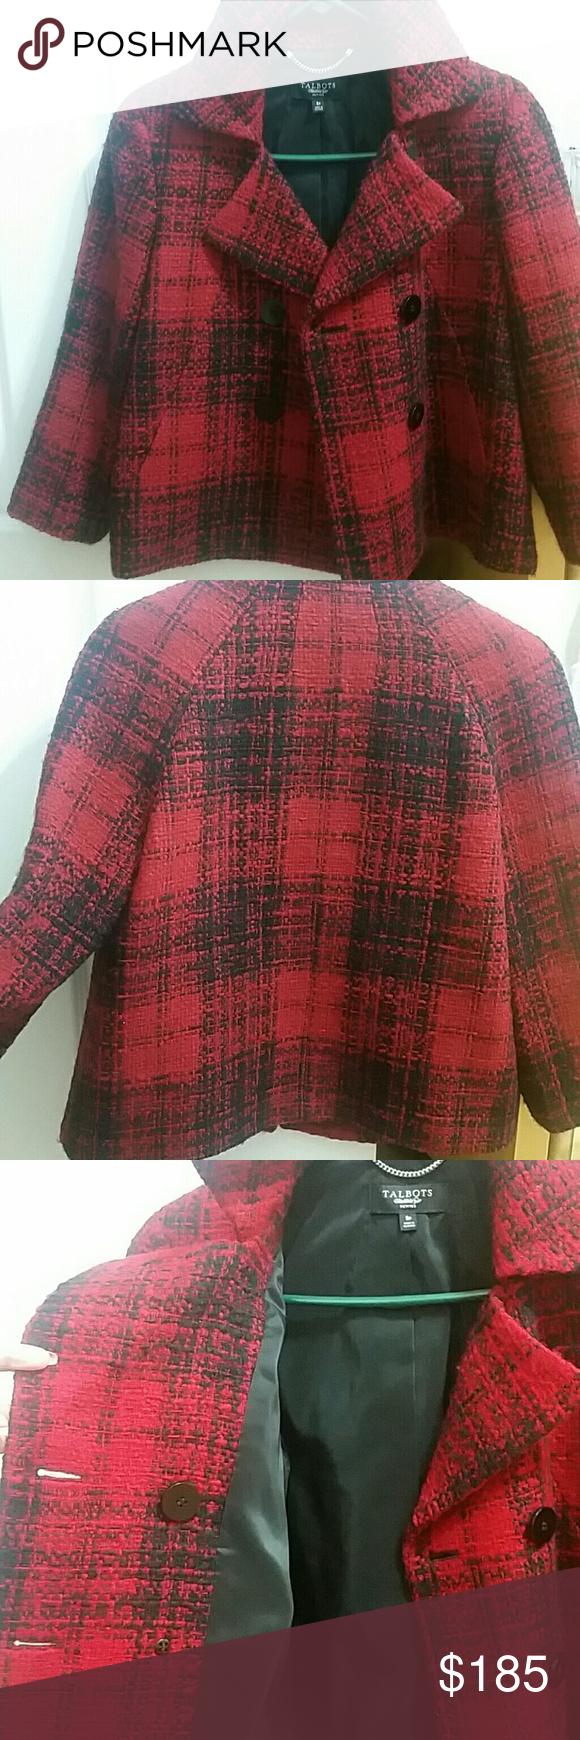 Pea coat red/black print,double-breasted overcoat Talbots Jackets & Coats Pea Coats